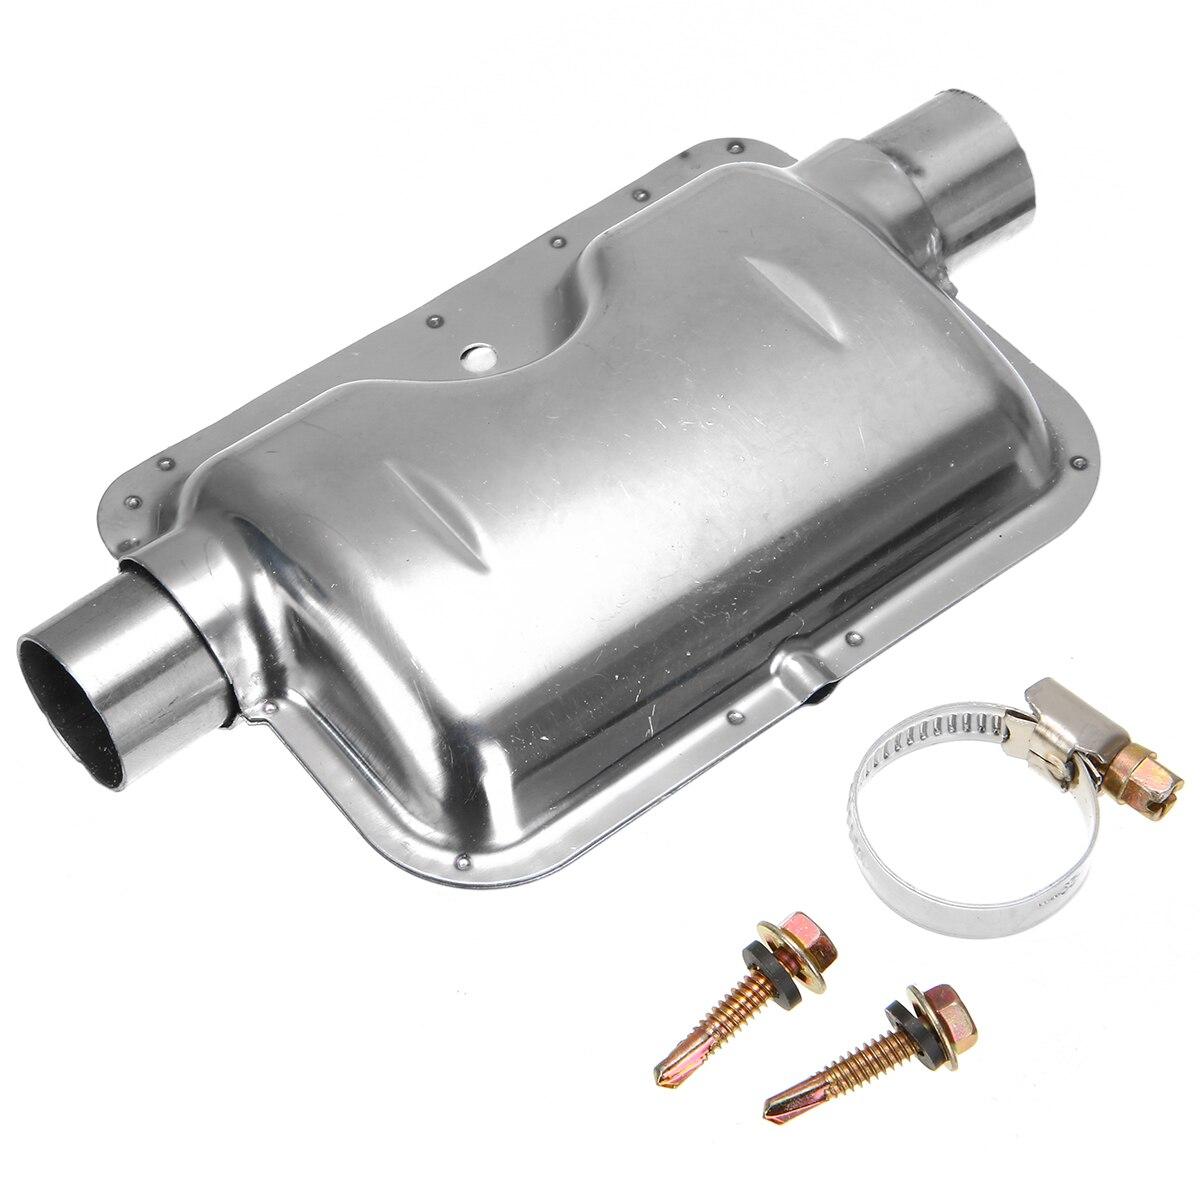 Caliber 24mm Exhaust Pipe Silencer for Similar Air Diesel Parking Heater Muffler